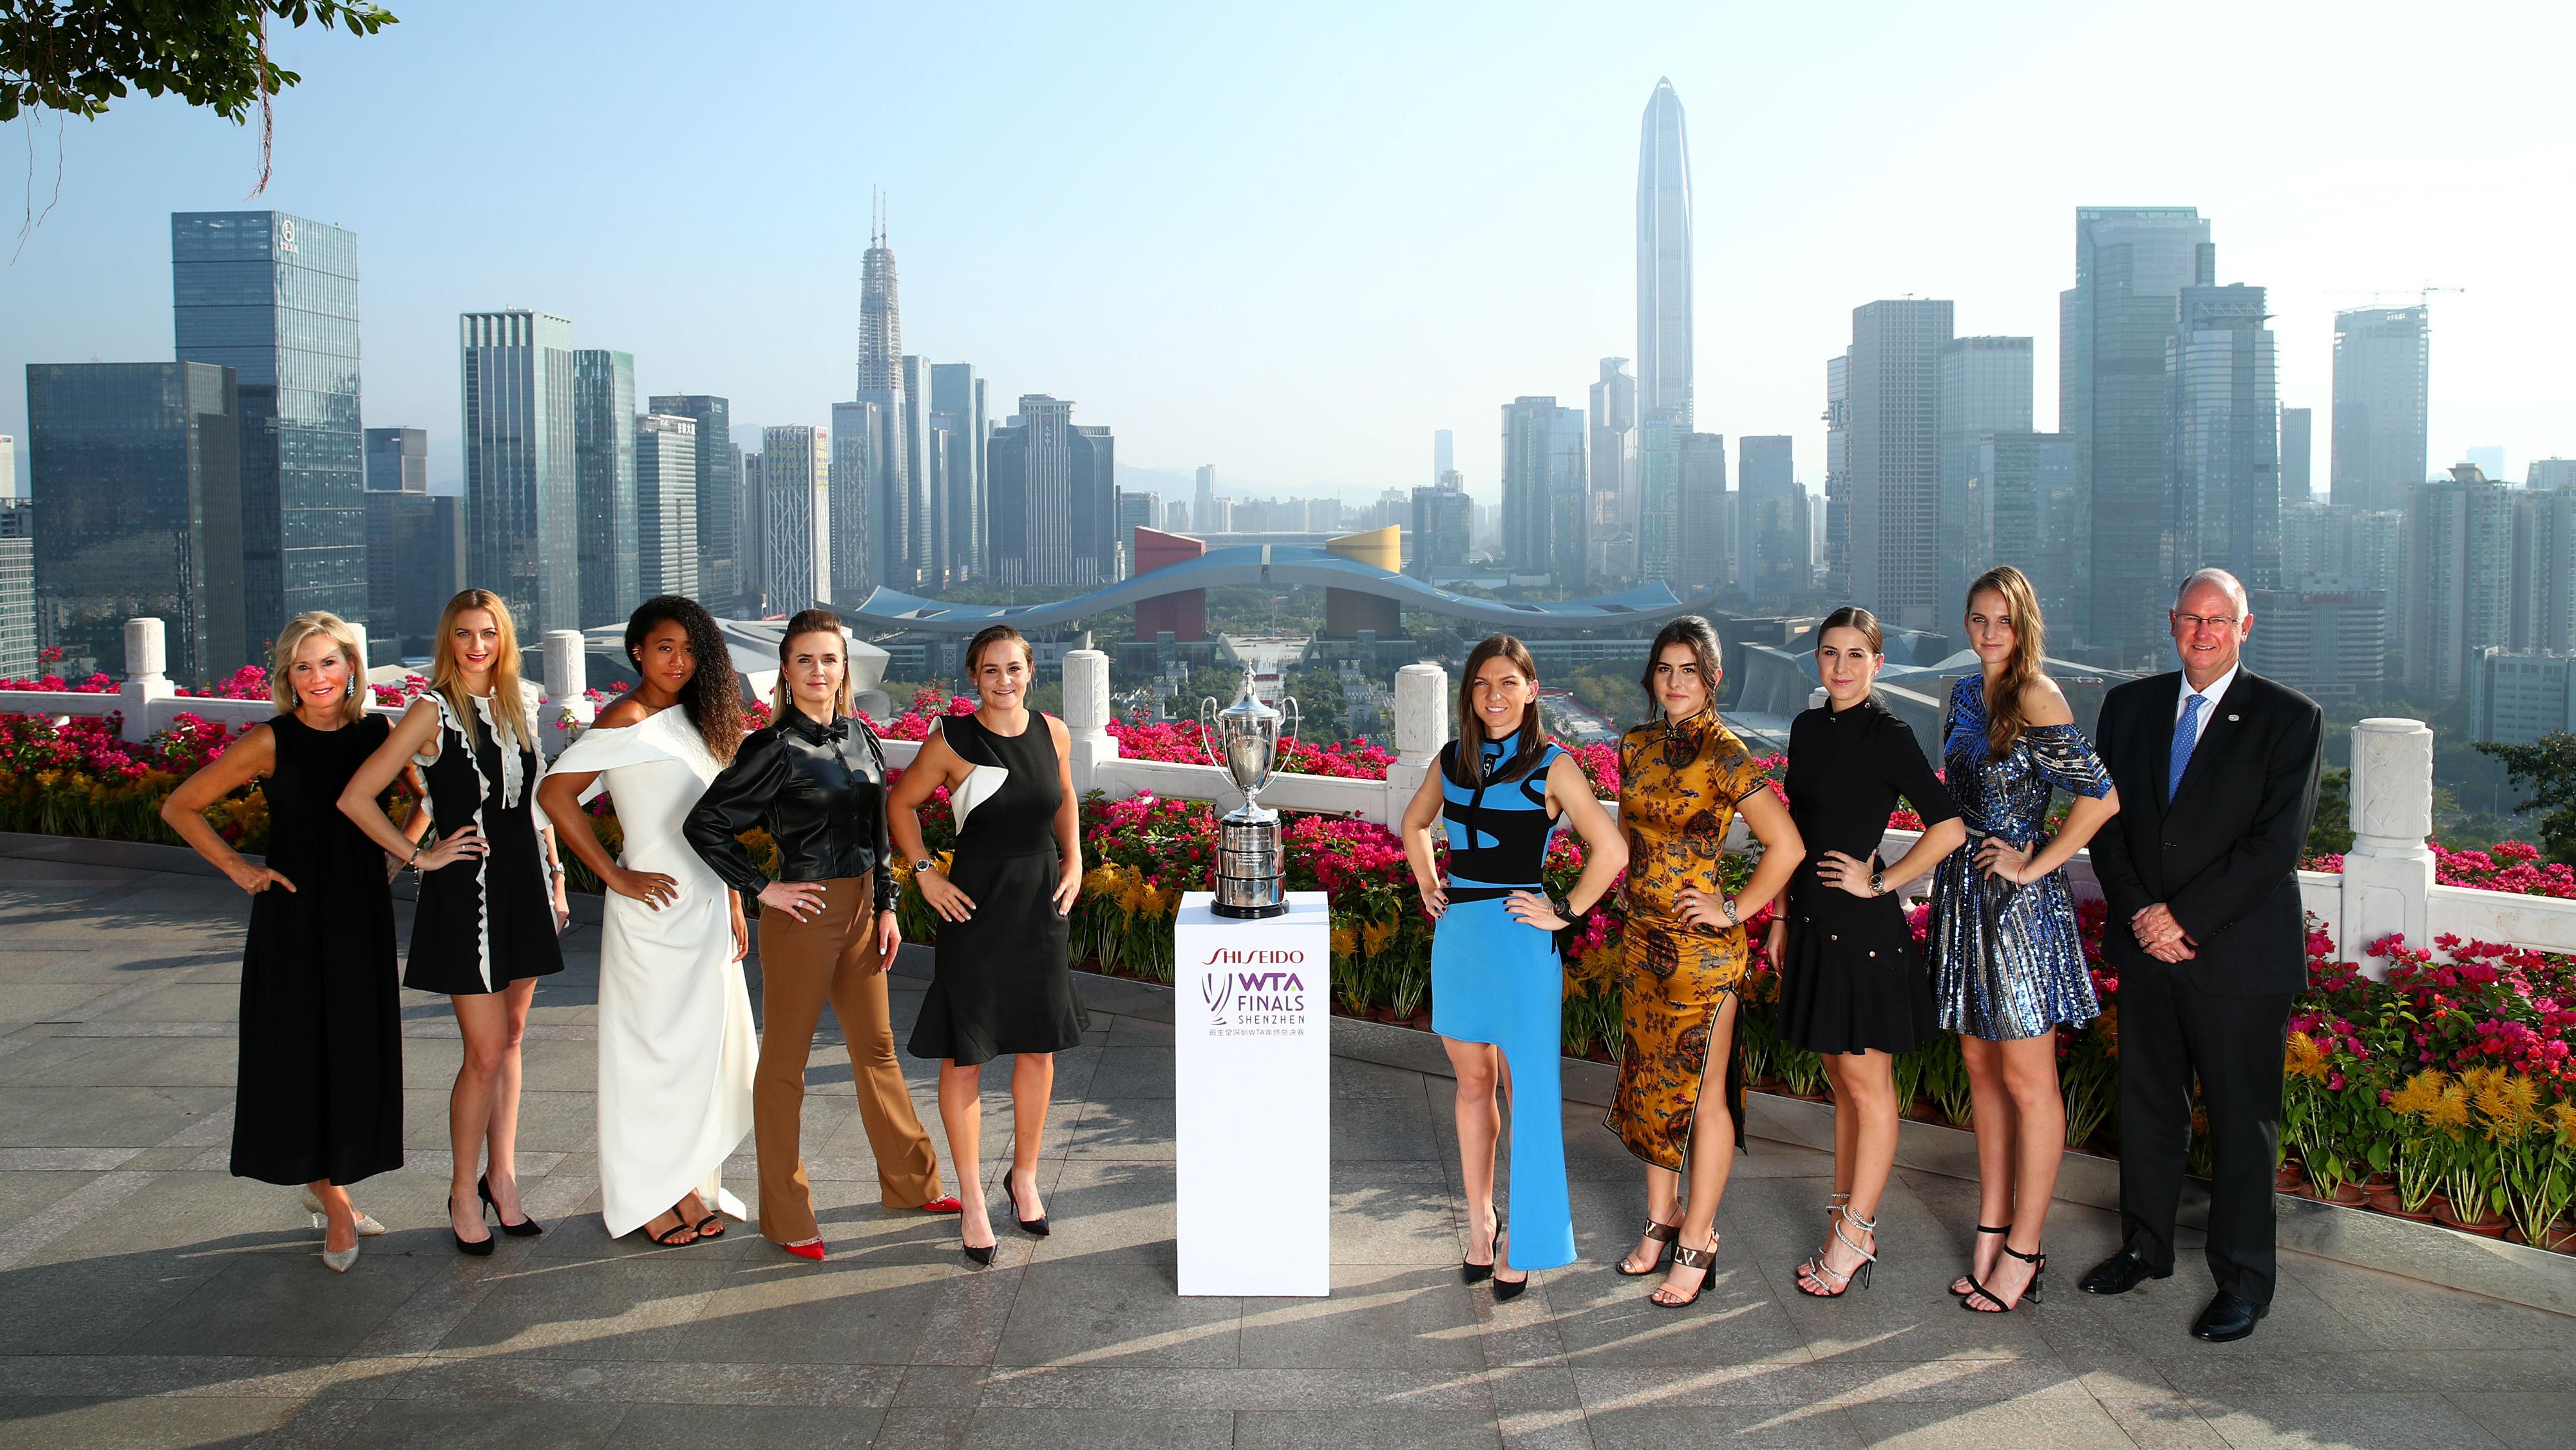 2019 Season WTA Player Awards: Nominations announced